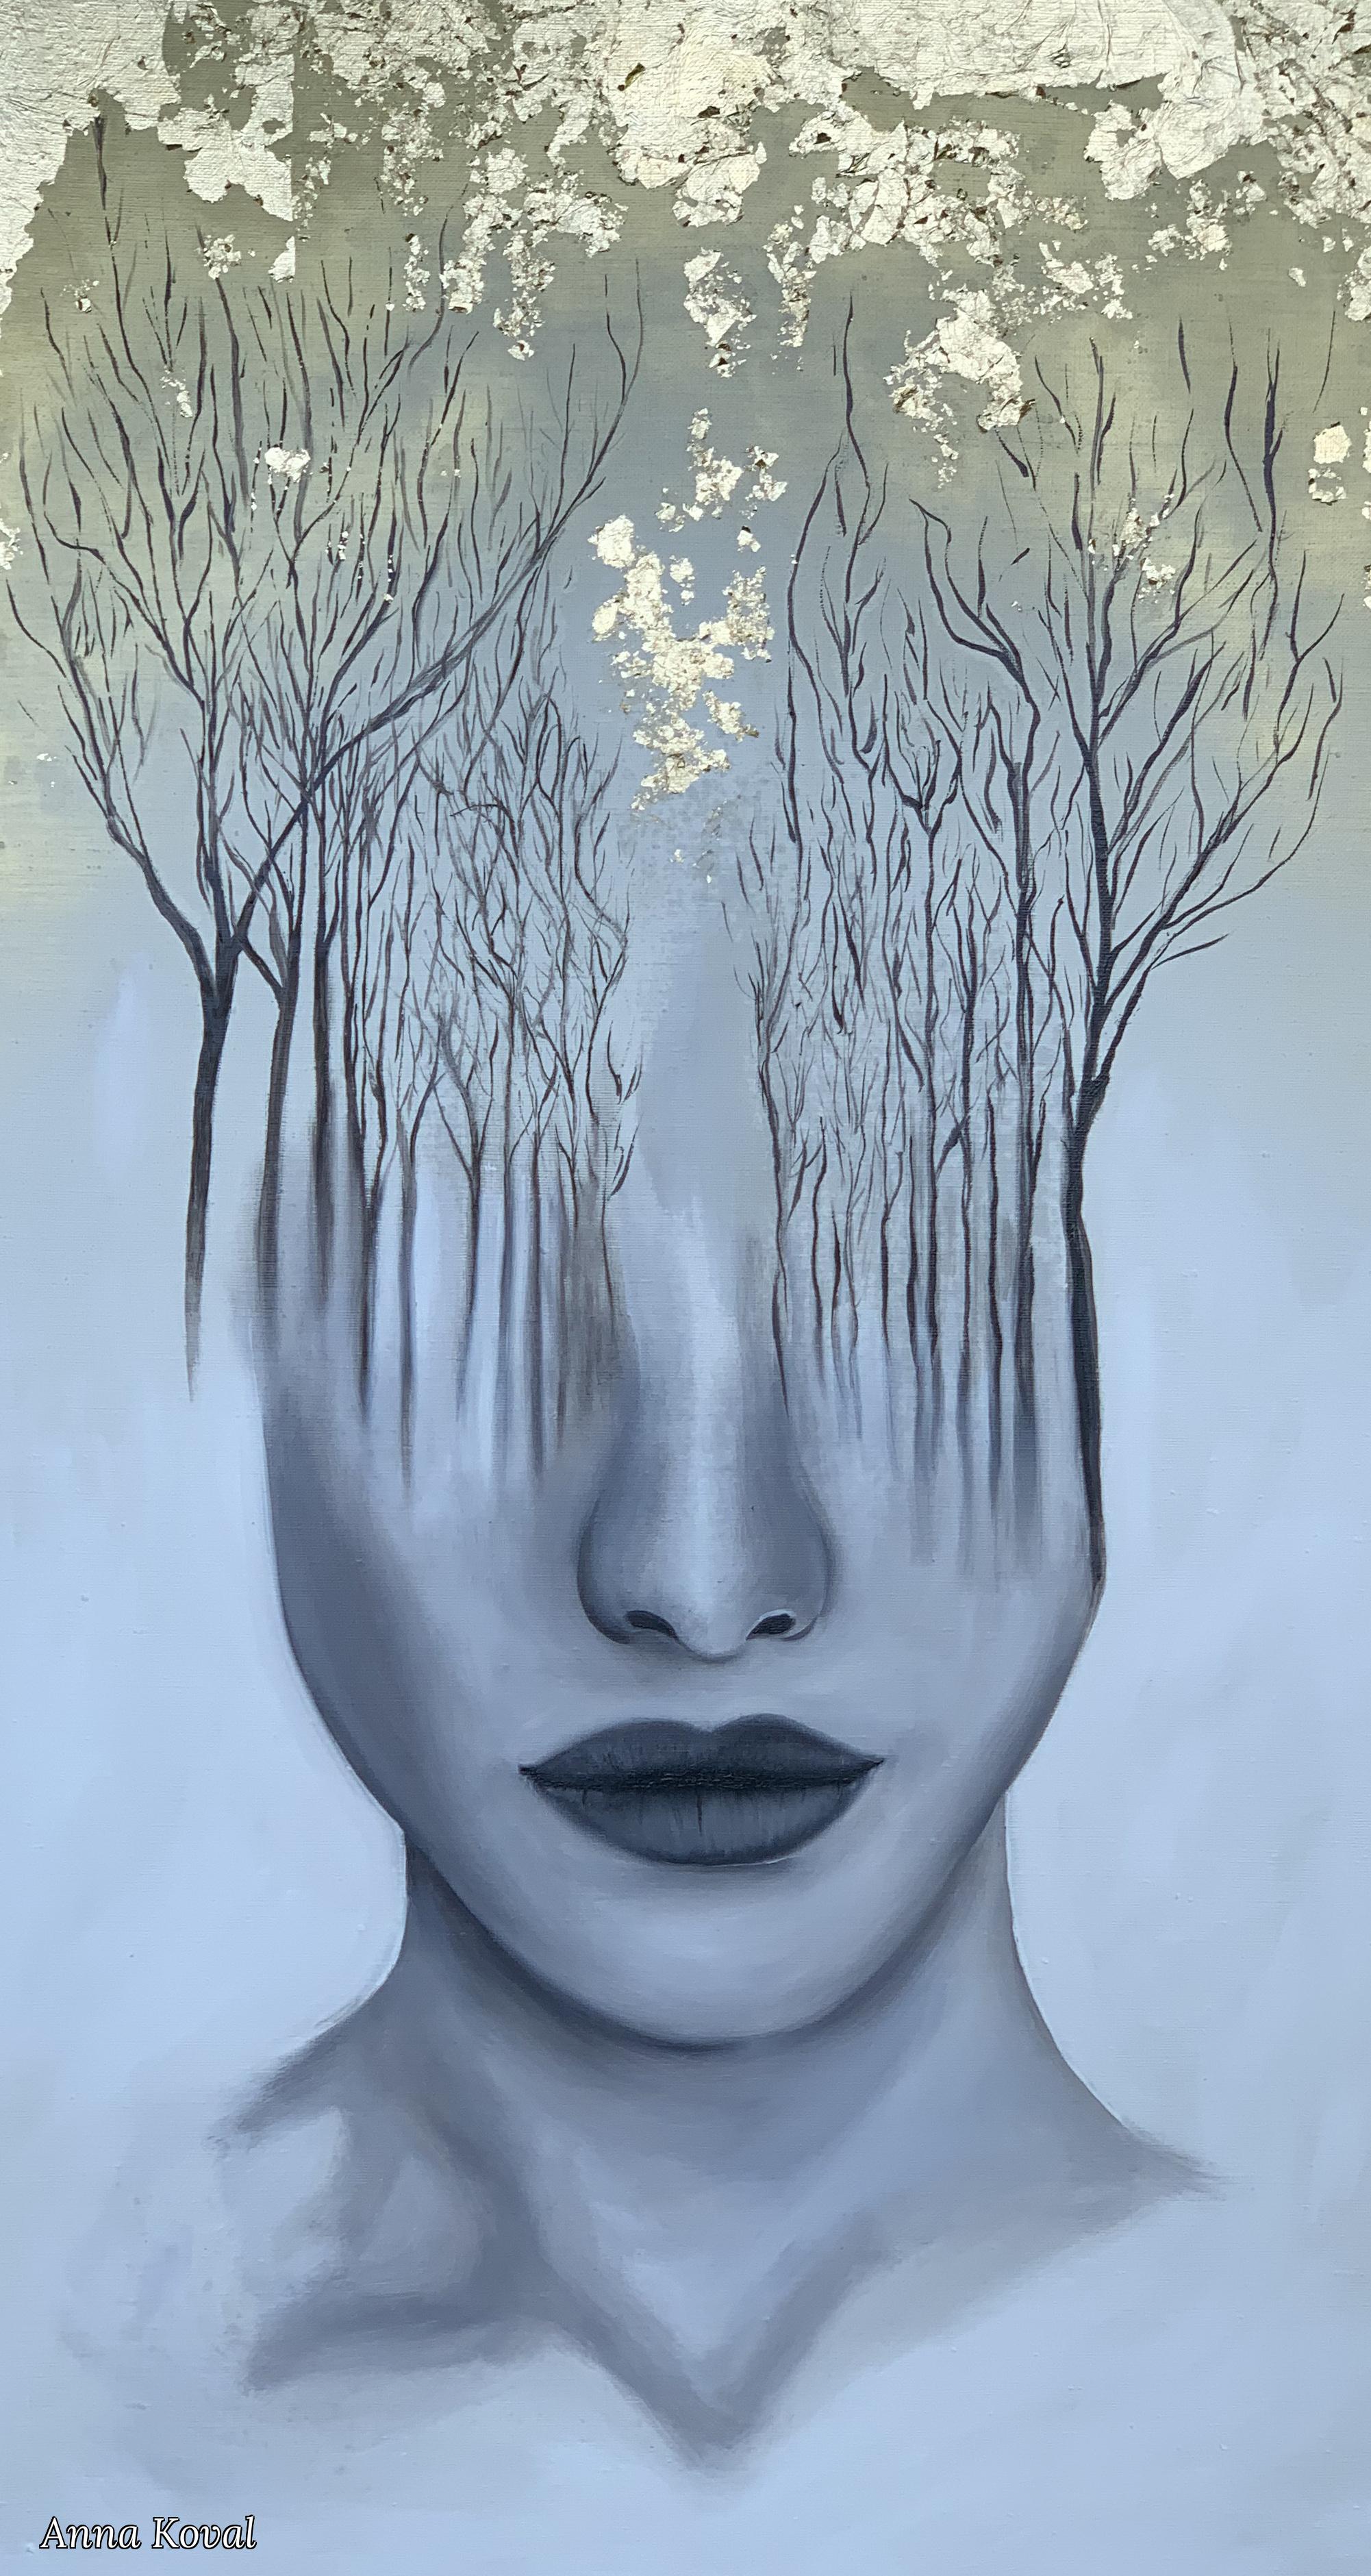 Anna Koval. Growing desires